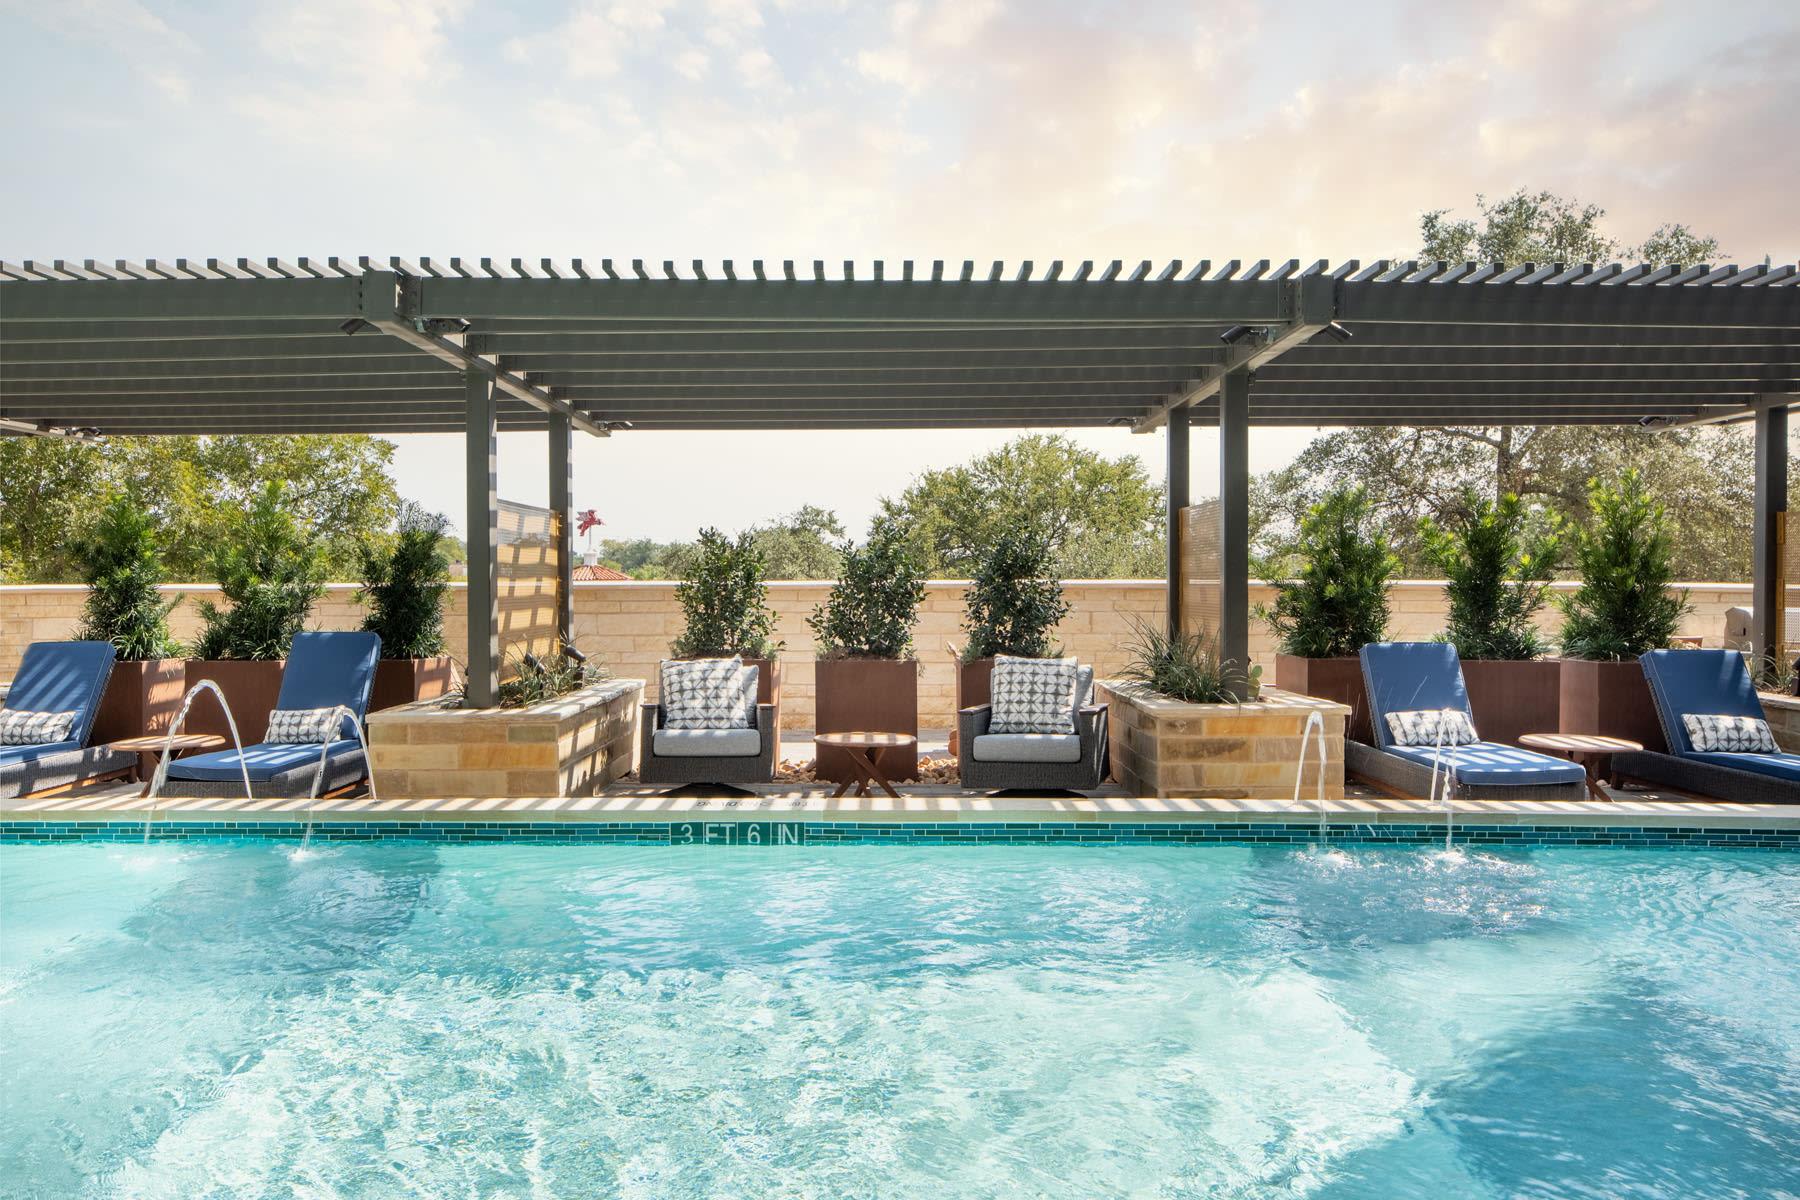 Plenty of plush seating next to the pool at Magnolia Heights in San Antonio, Texas